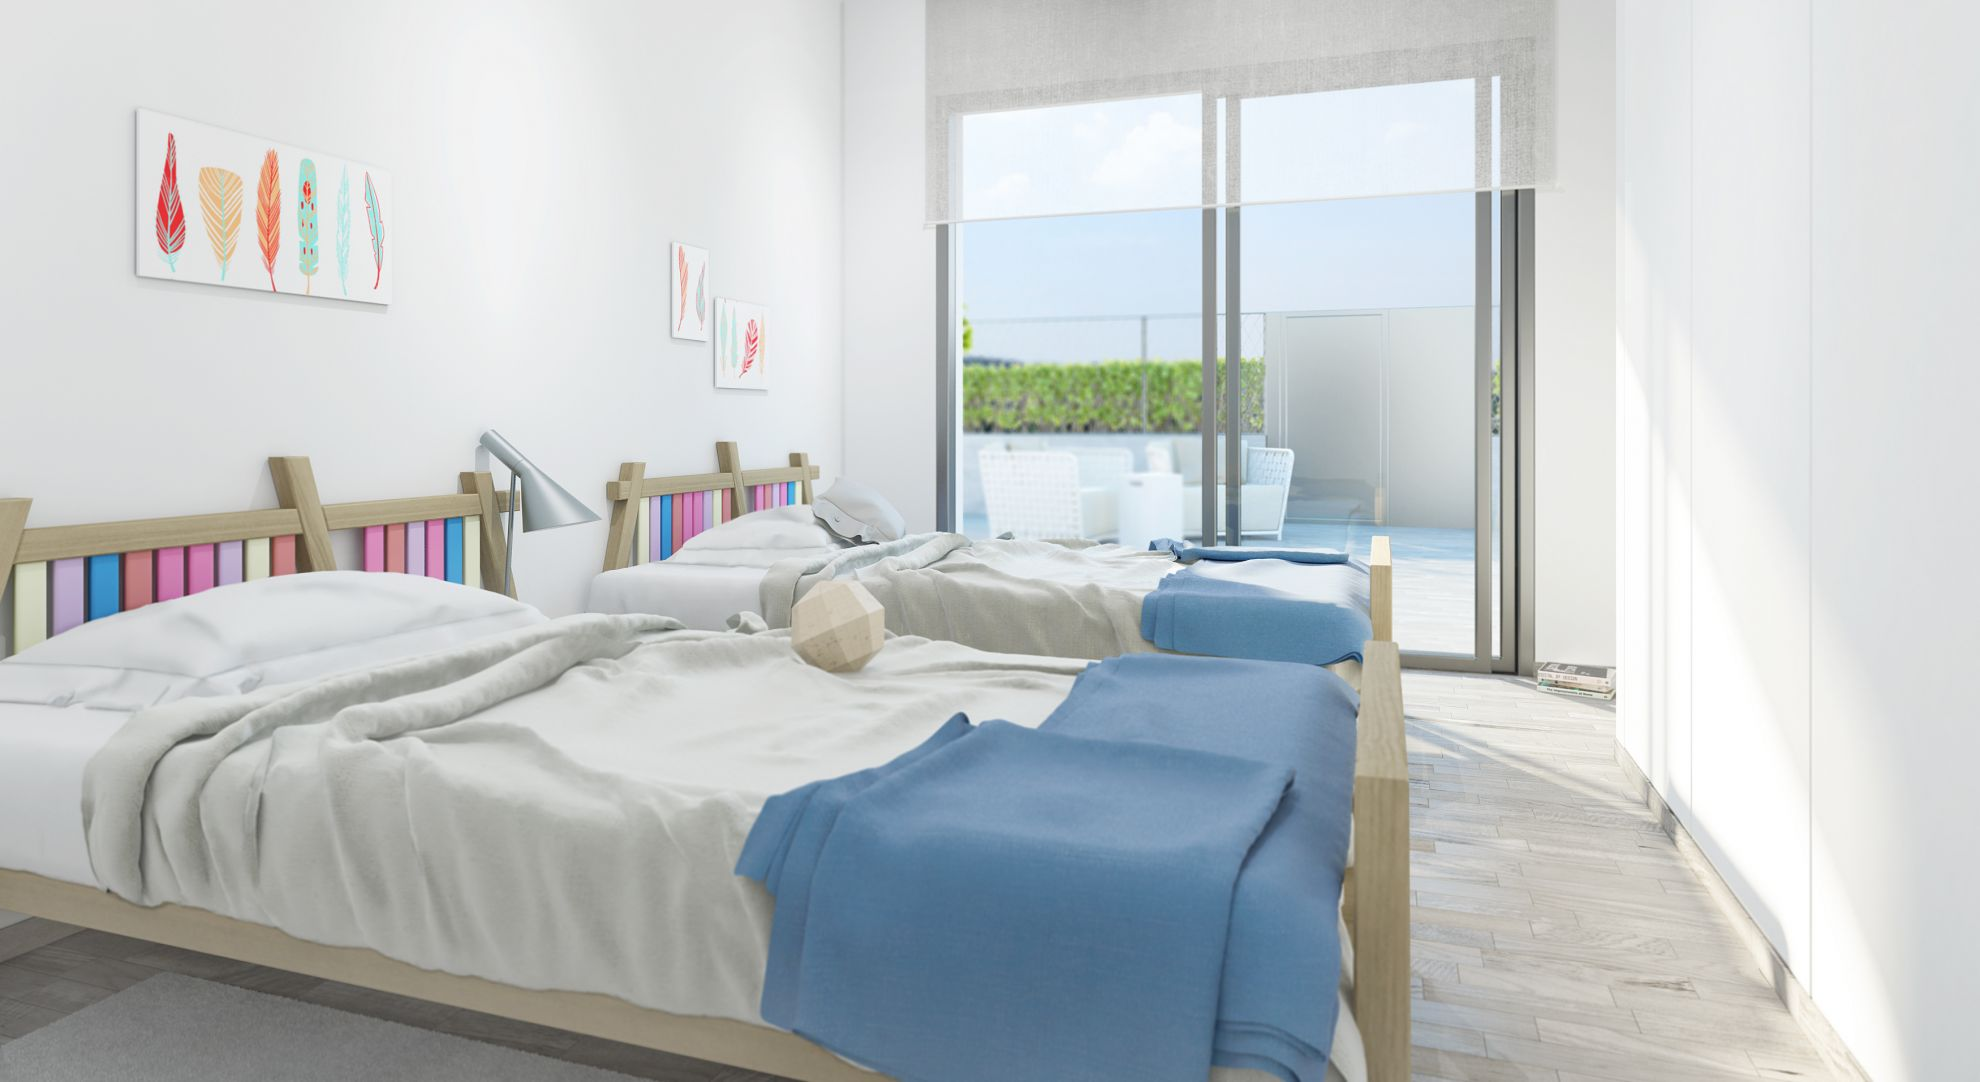 3 bedroom villa with private garden in complex with pool in Villamartín 4